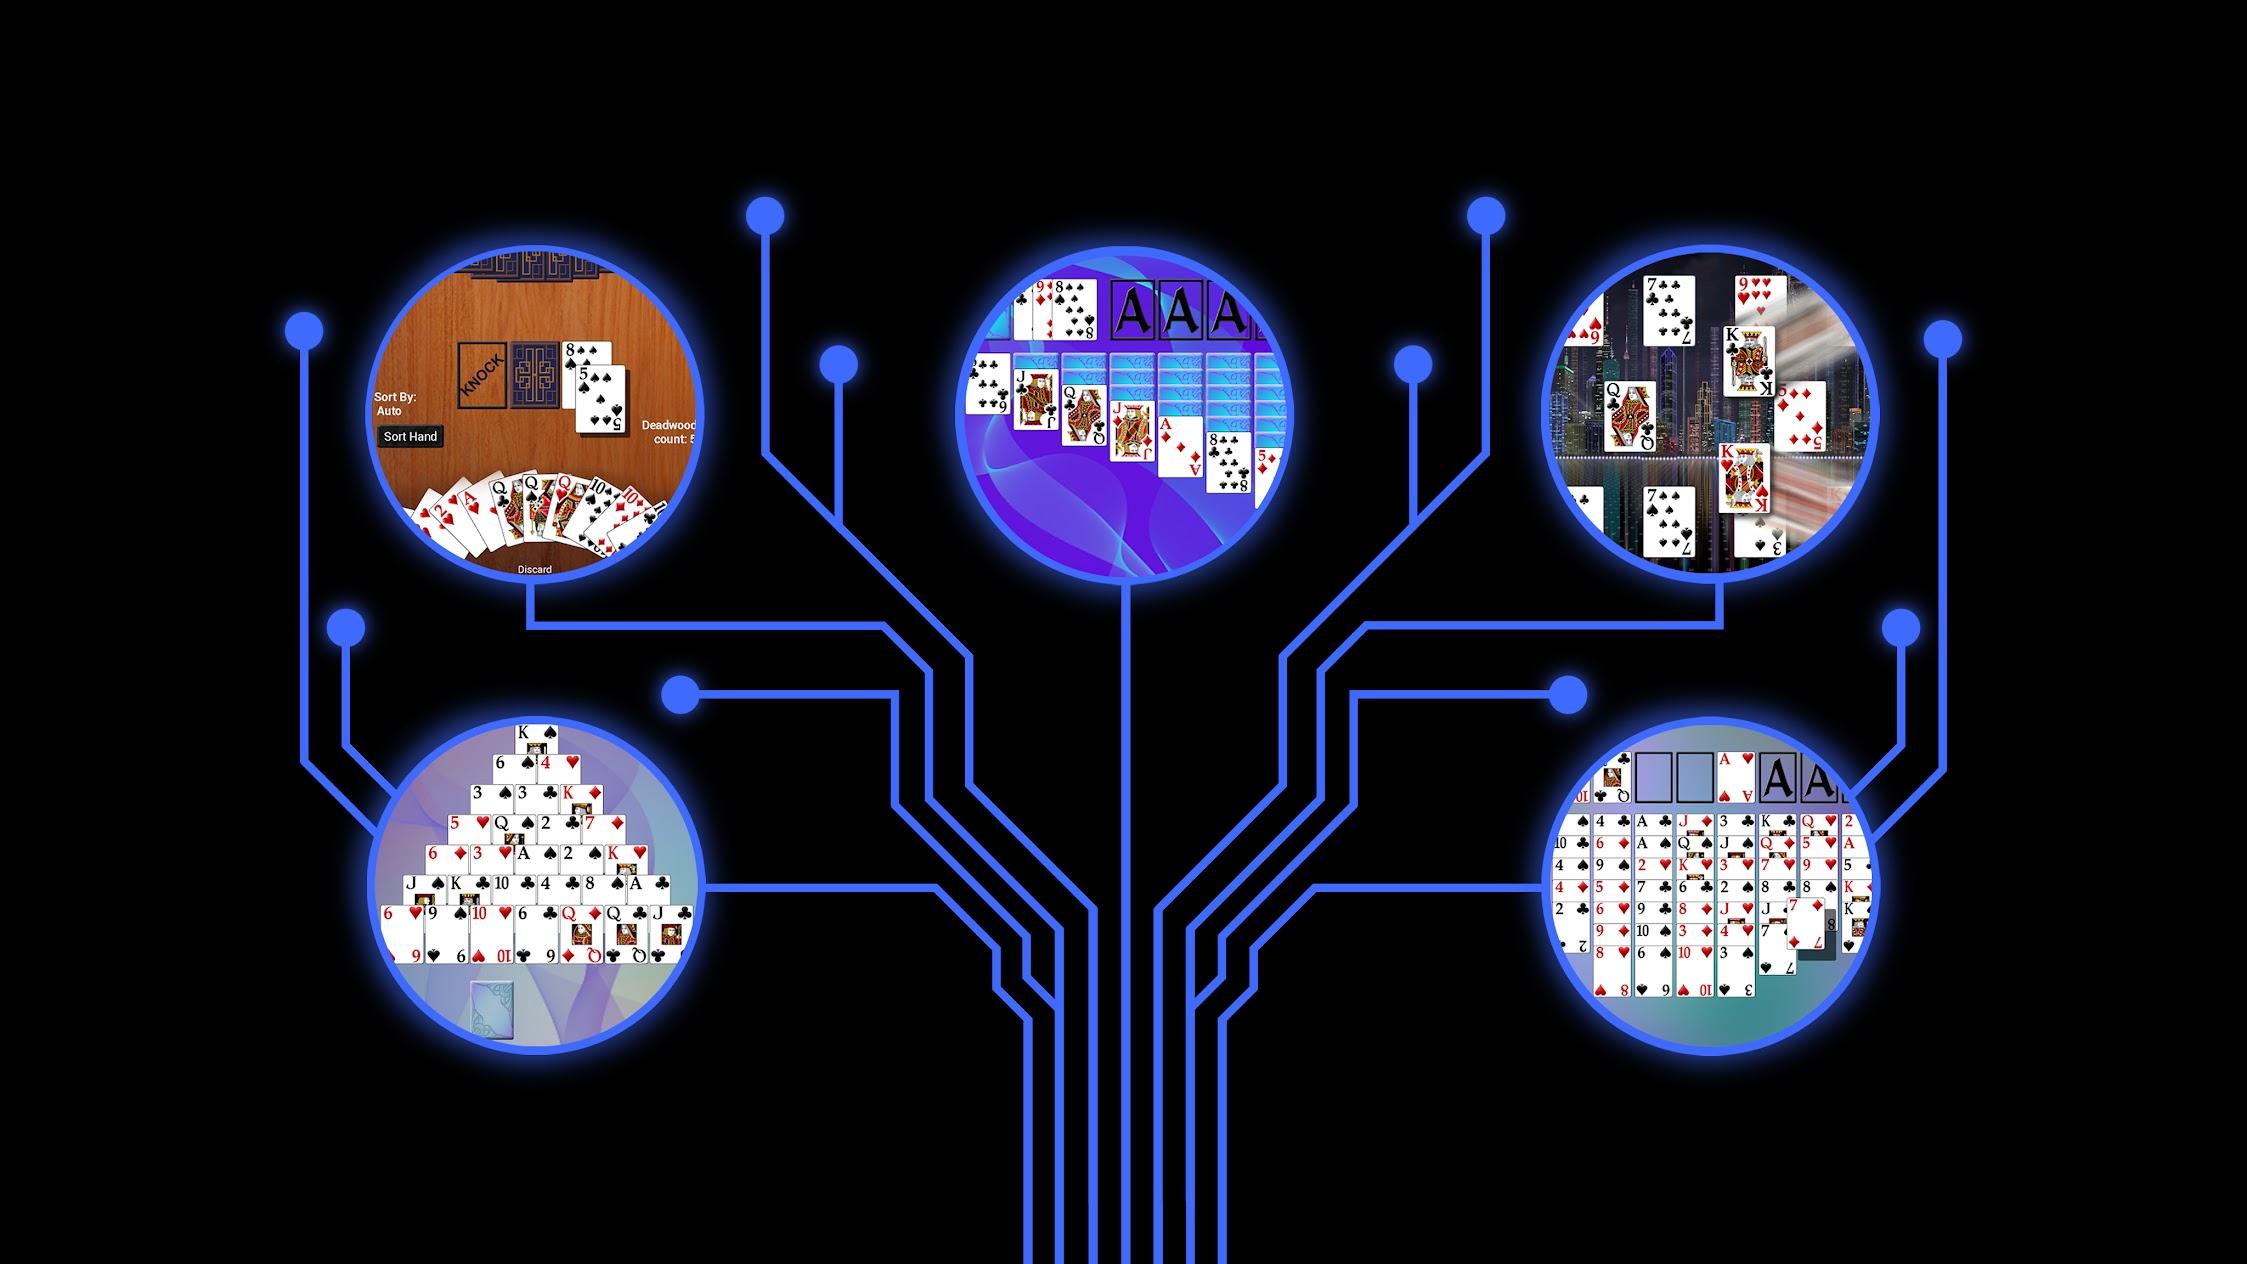 Tesseract Mobile